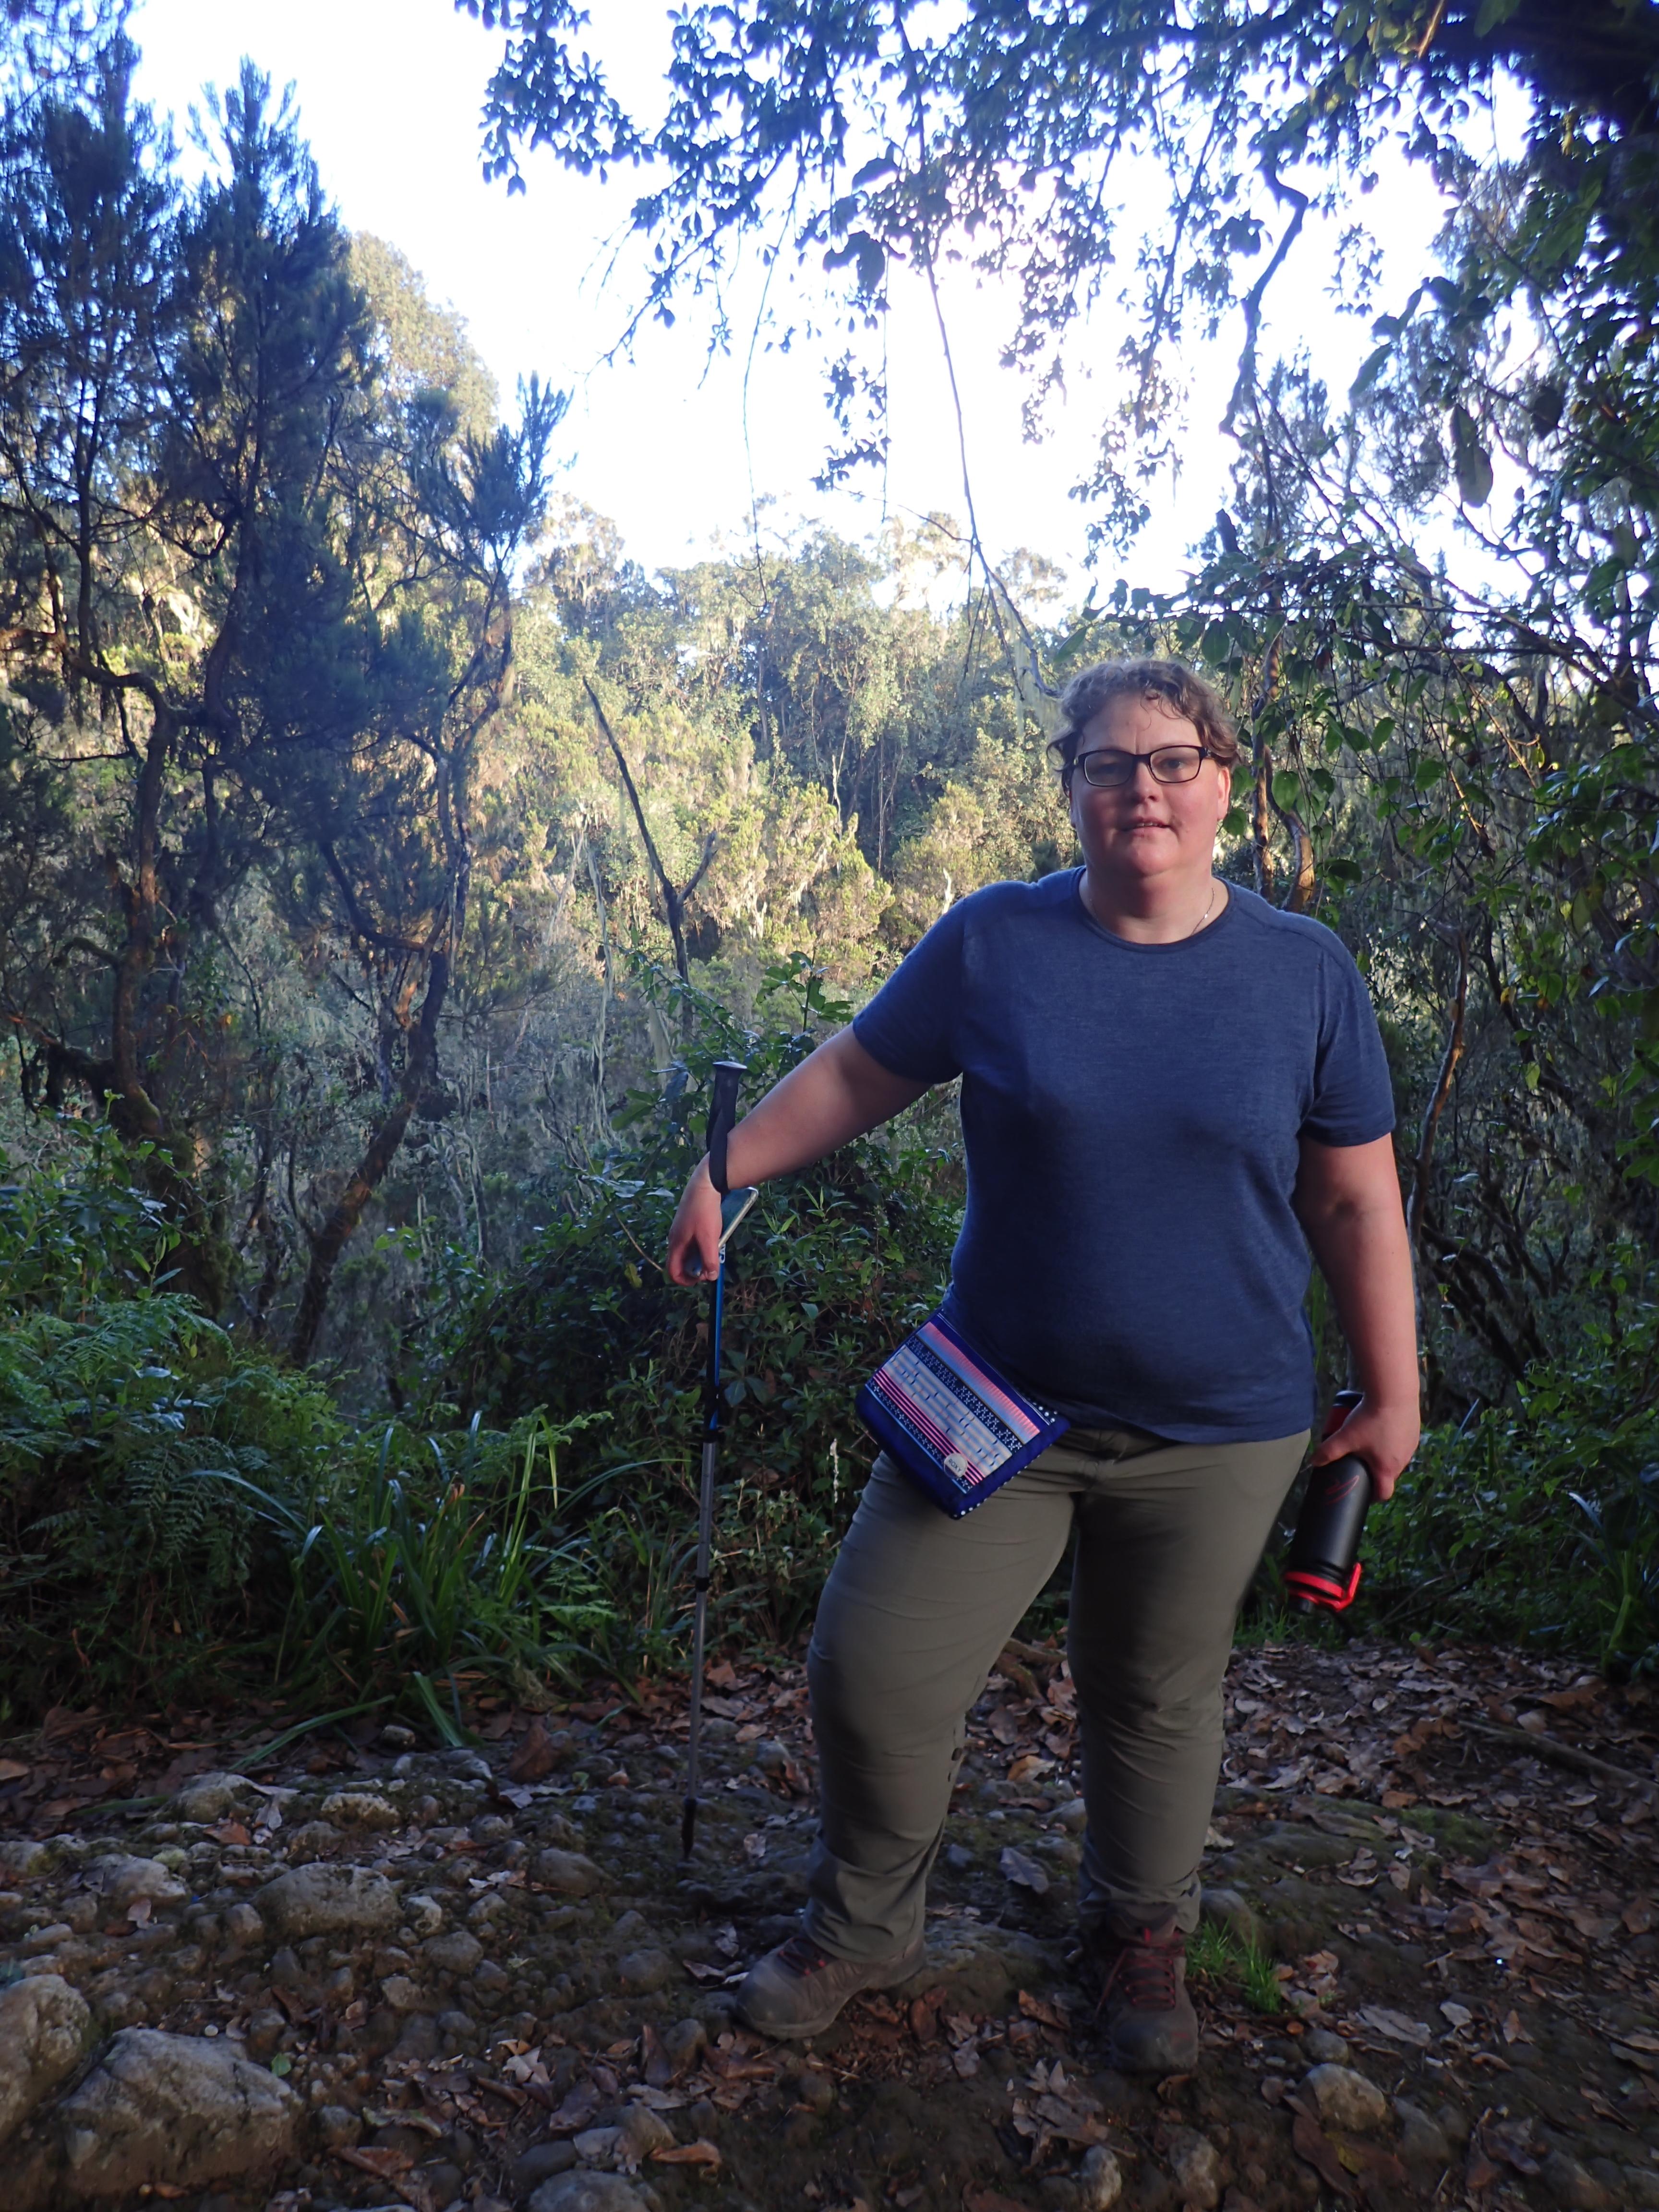 Var Projekt Kilimanjaro en succes?